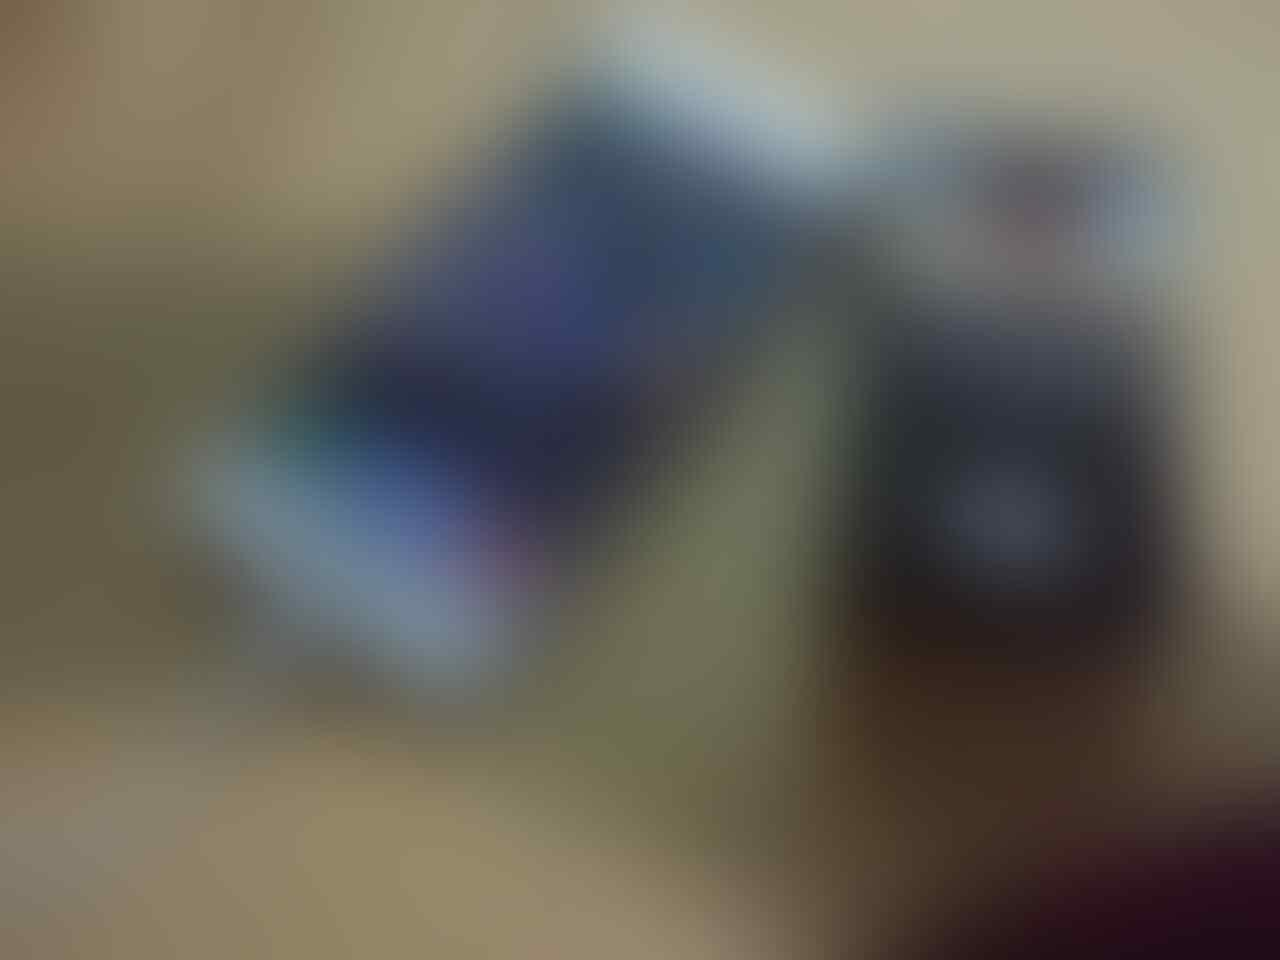 iPhone Murah? Mustahil